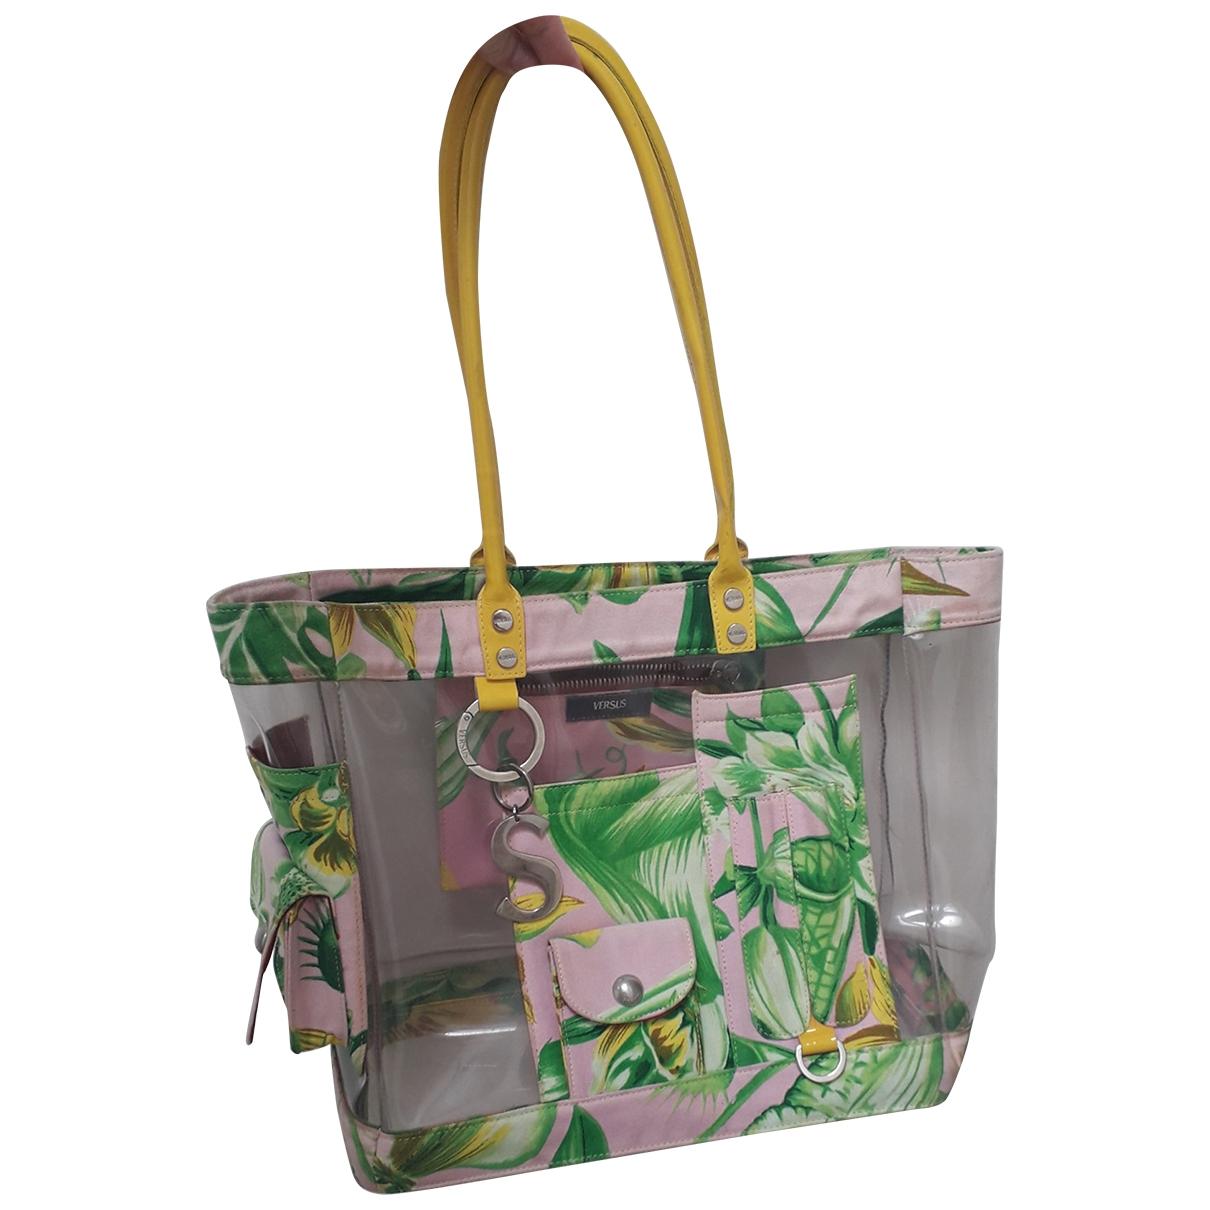 Versus \N Multicolour handbag for Women \N